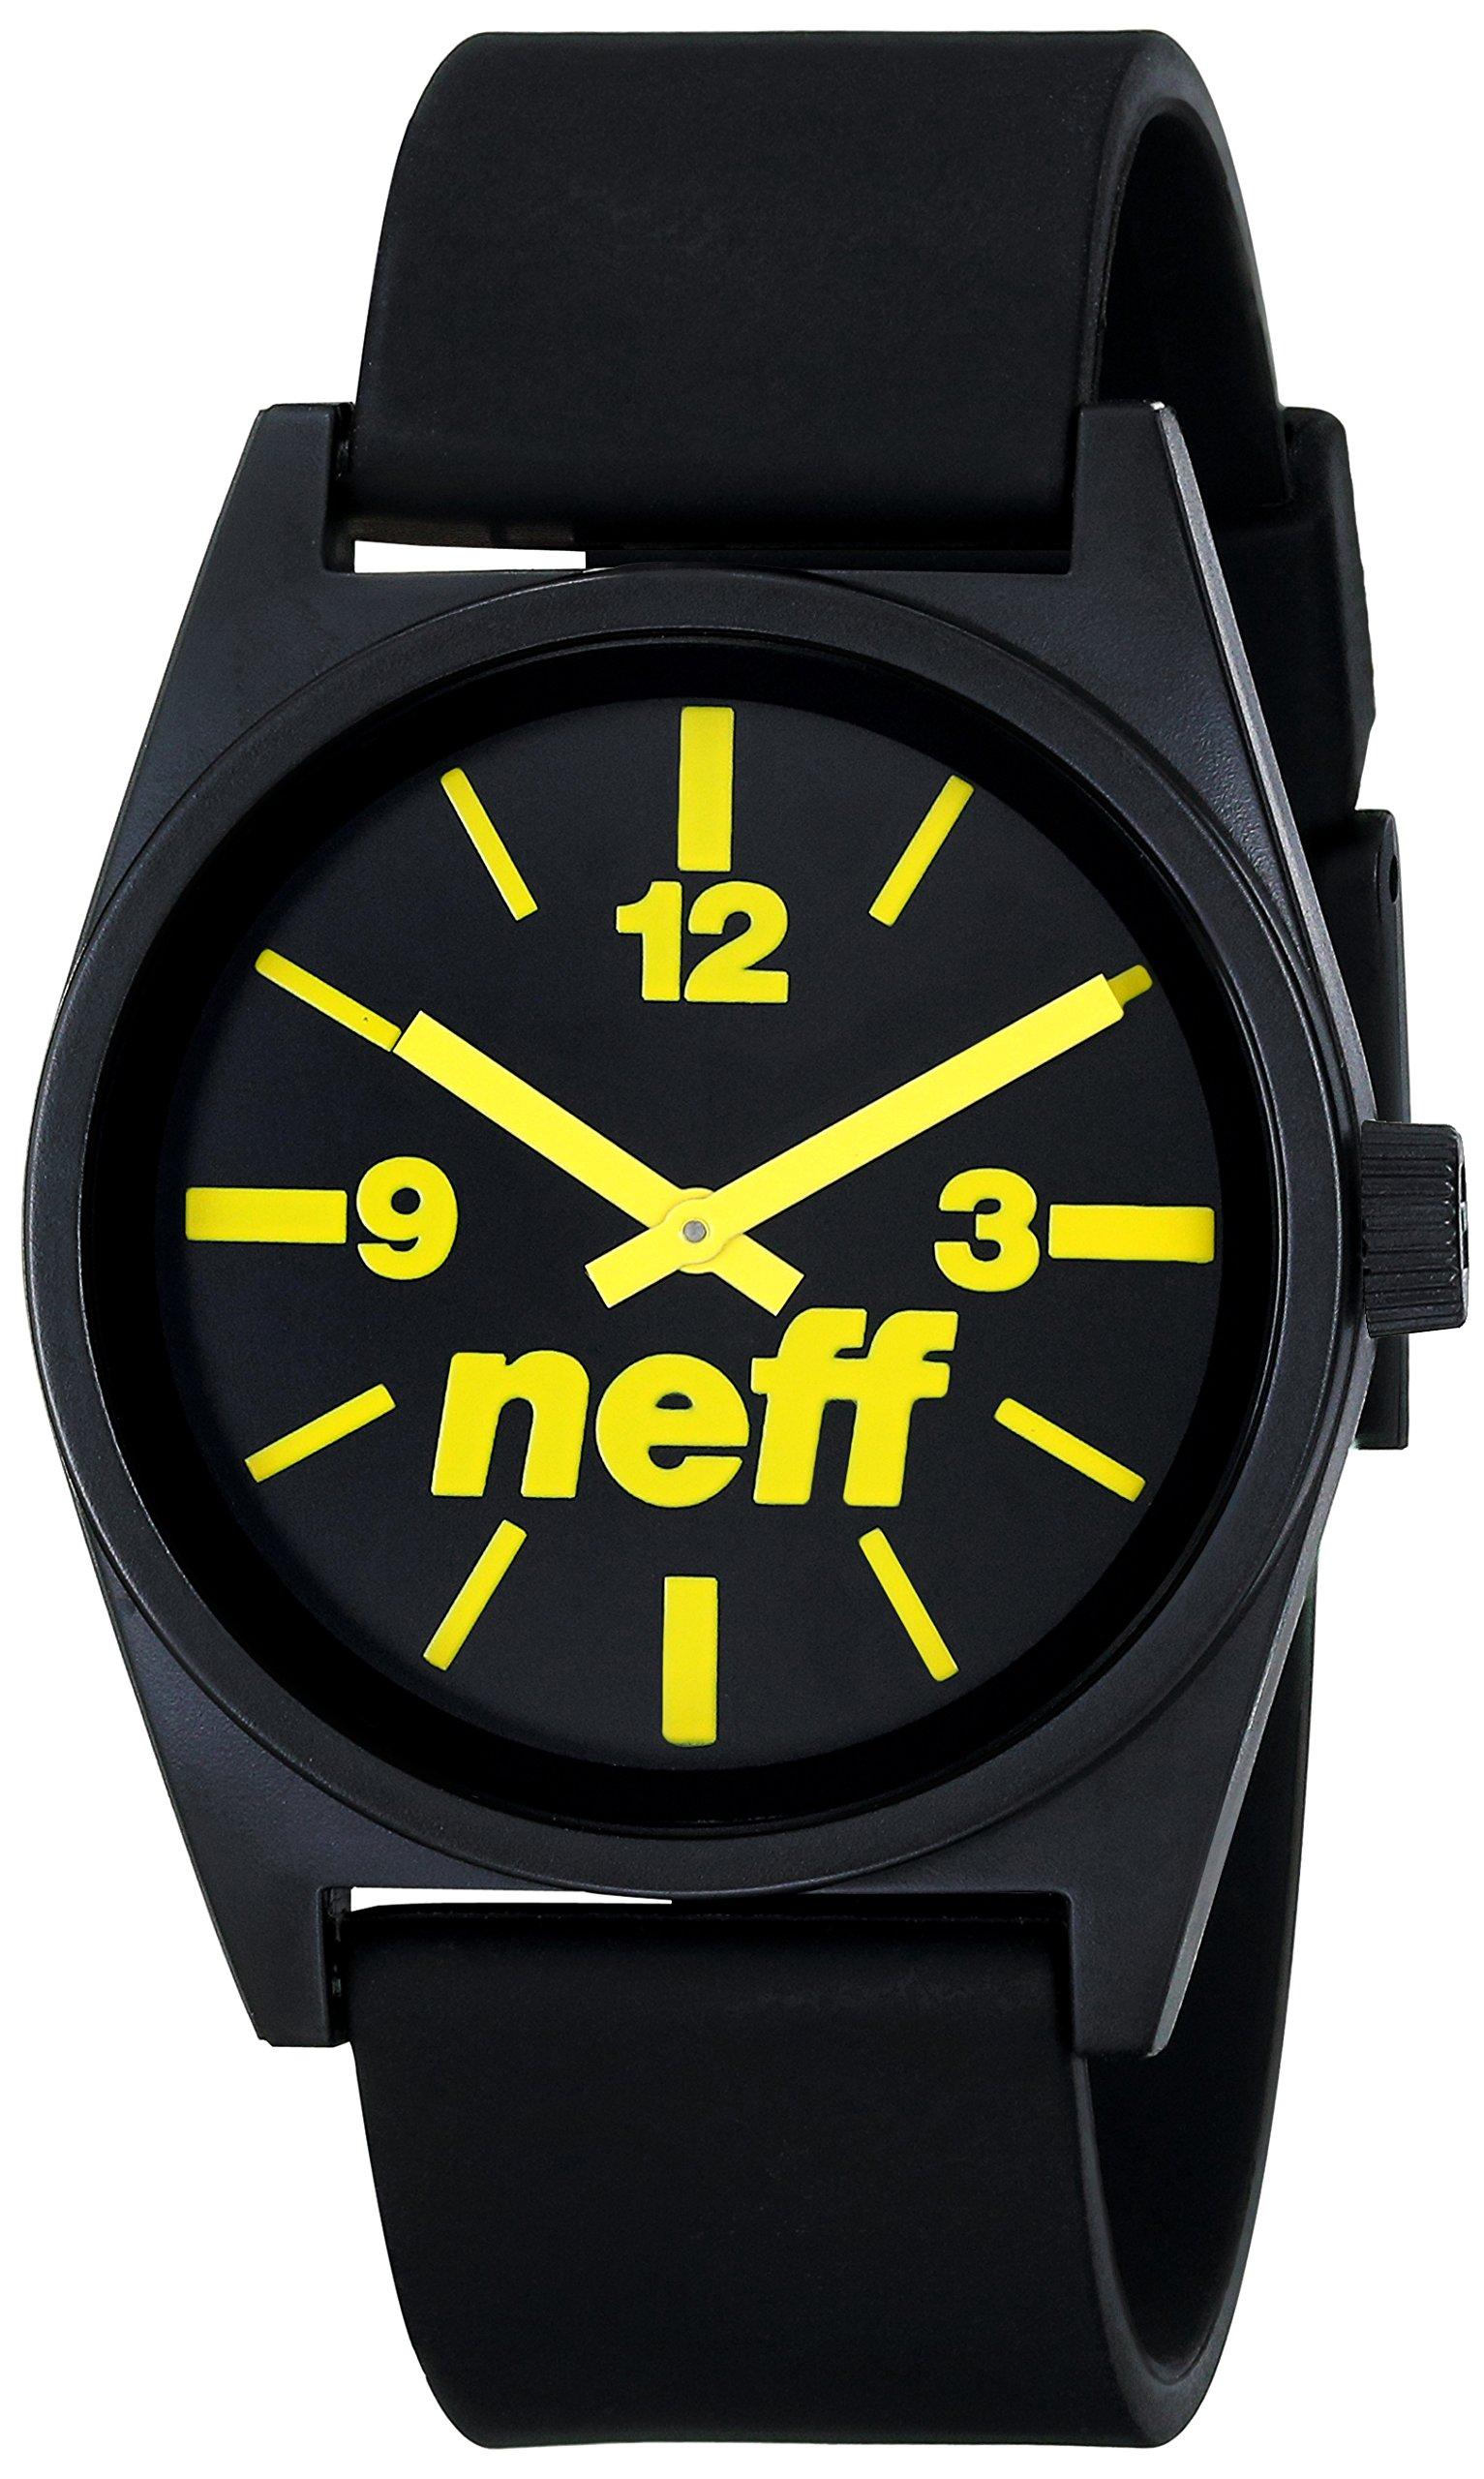 Neff Daily Analog Watches - Quartz Movement Waterproof Watch - Sport Watches for Men & Women